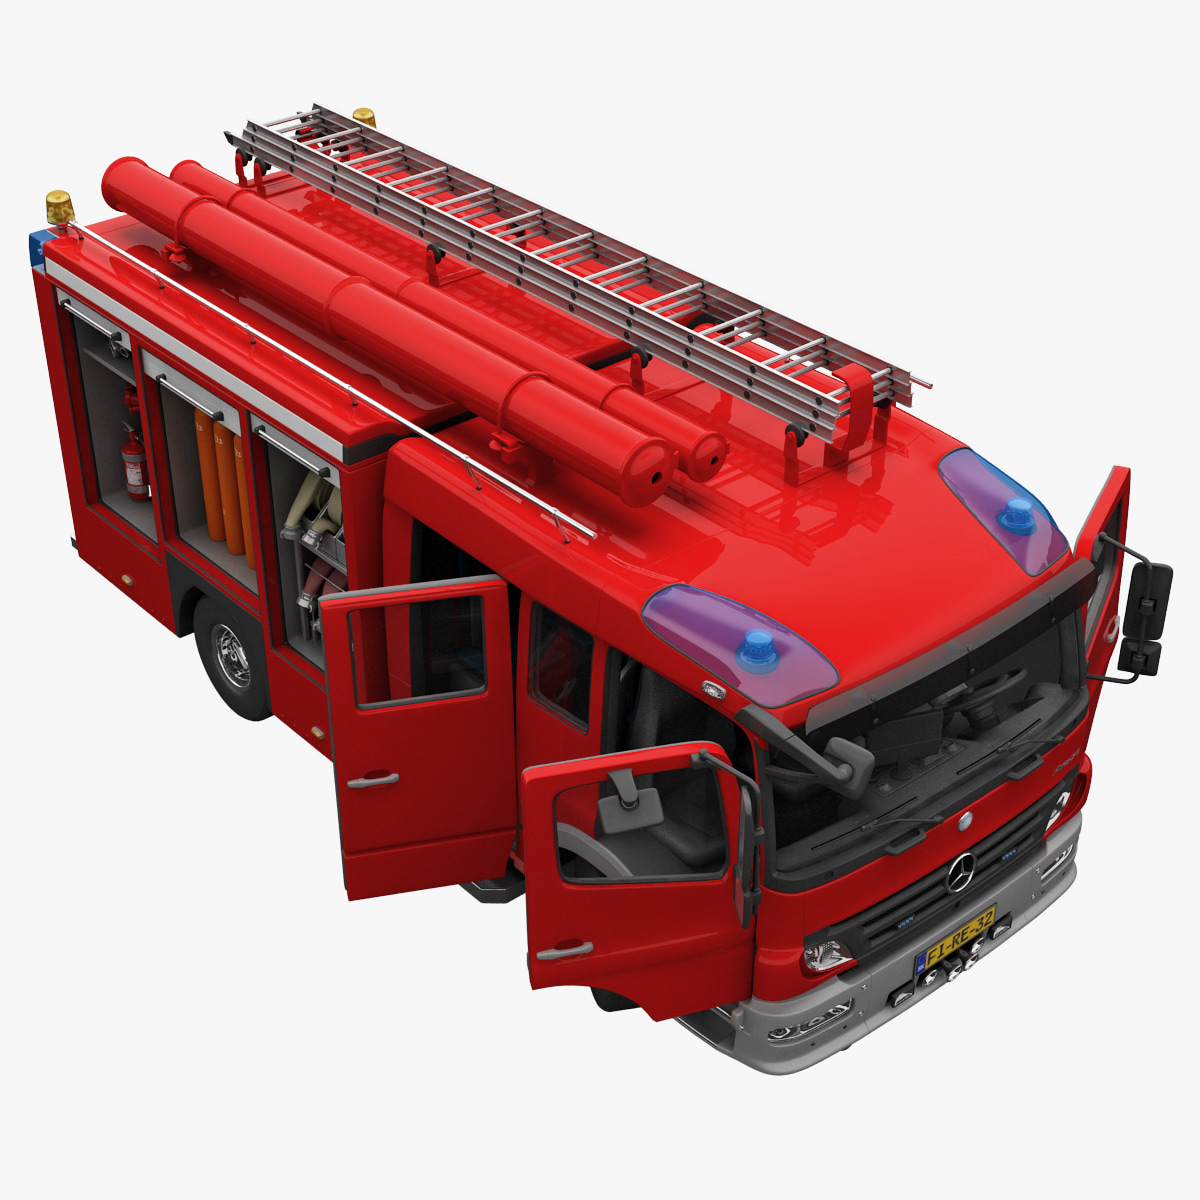 Mercedes_Atego_Fire_Truck_Rigged_0002.jpg